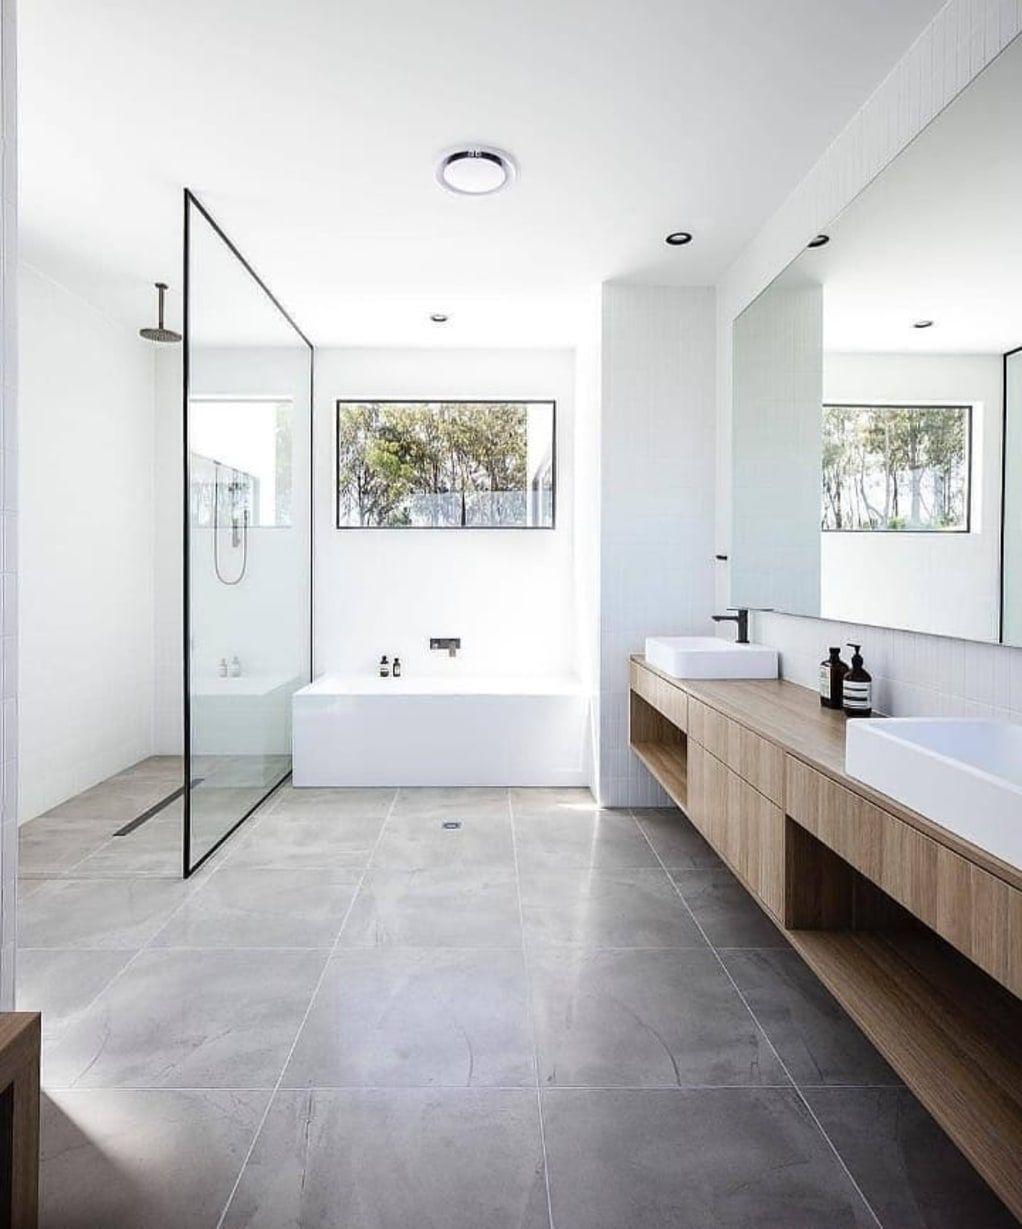 Minimal Interior Design Inspiration   180   Bathroom design, Bathroom design luxury, Modern ...